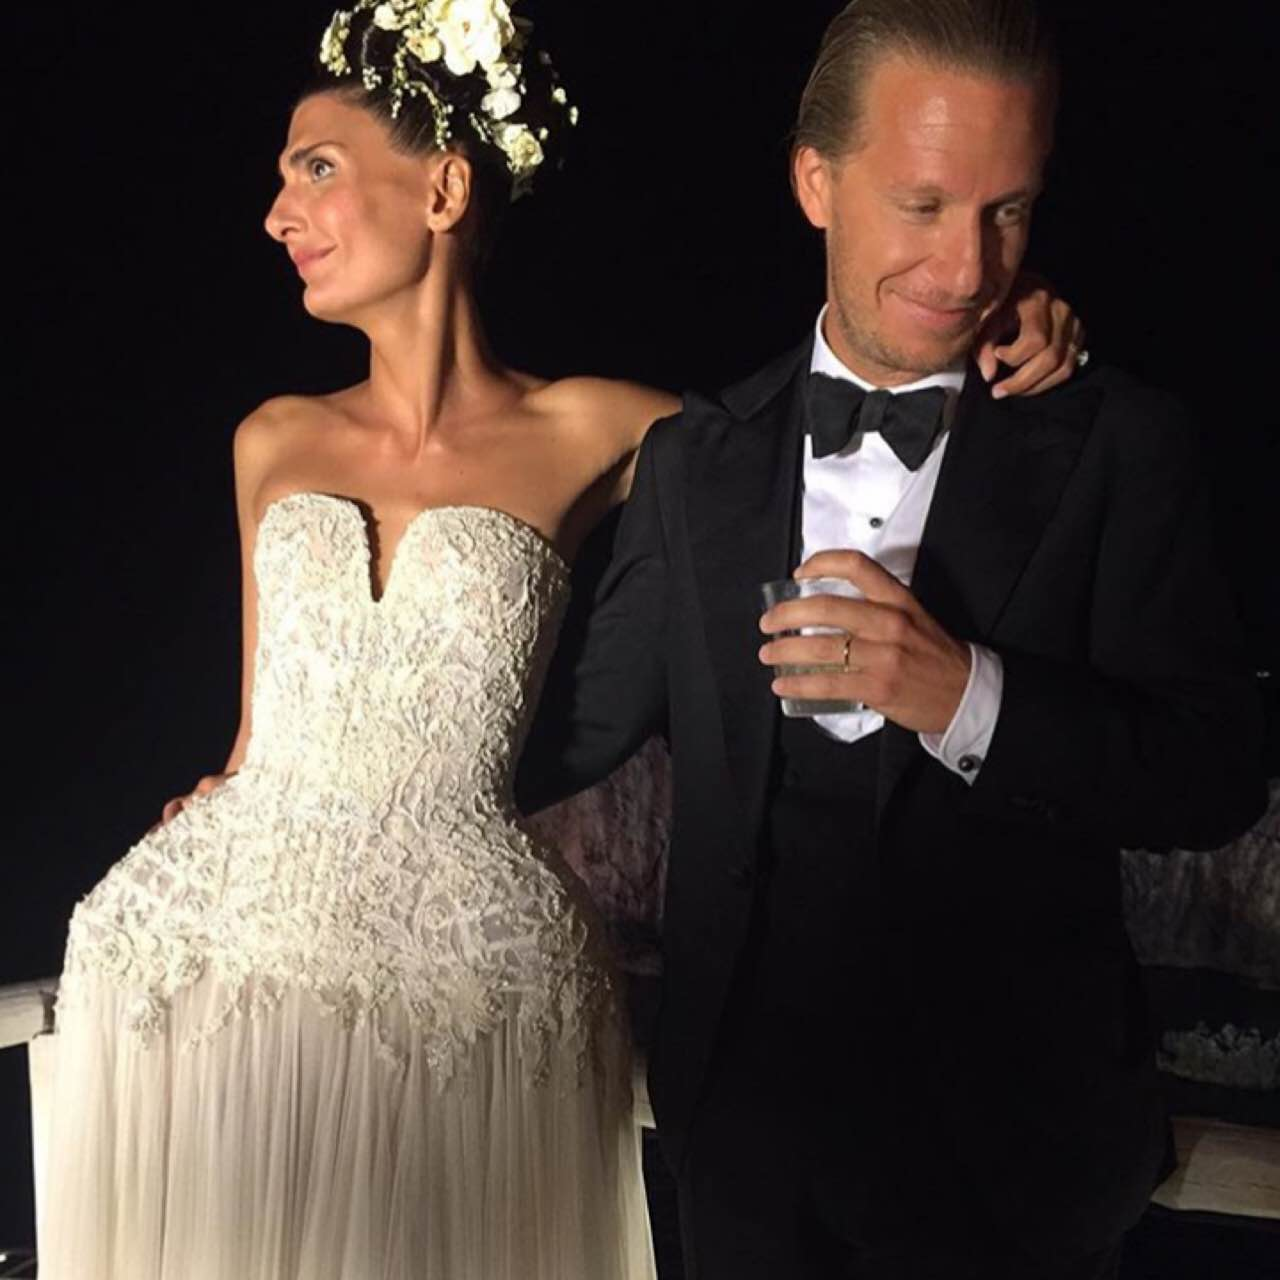 Giovanna-Battaglia-wedding-dress-alexander-mcqueen